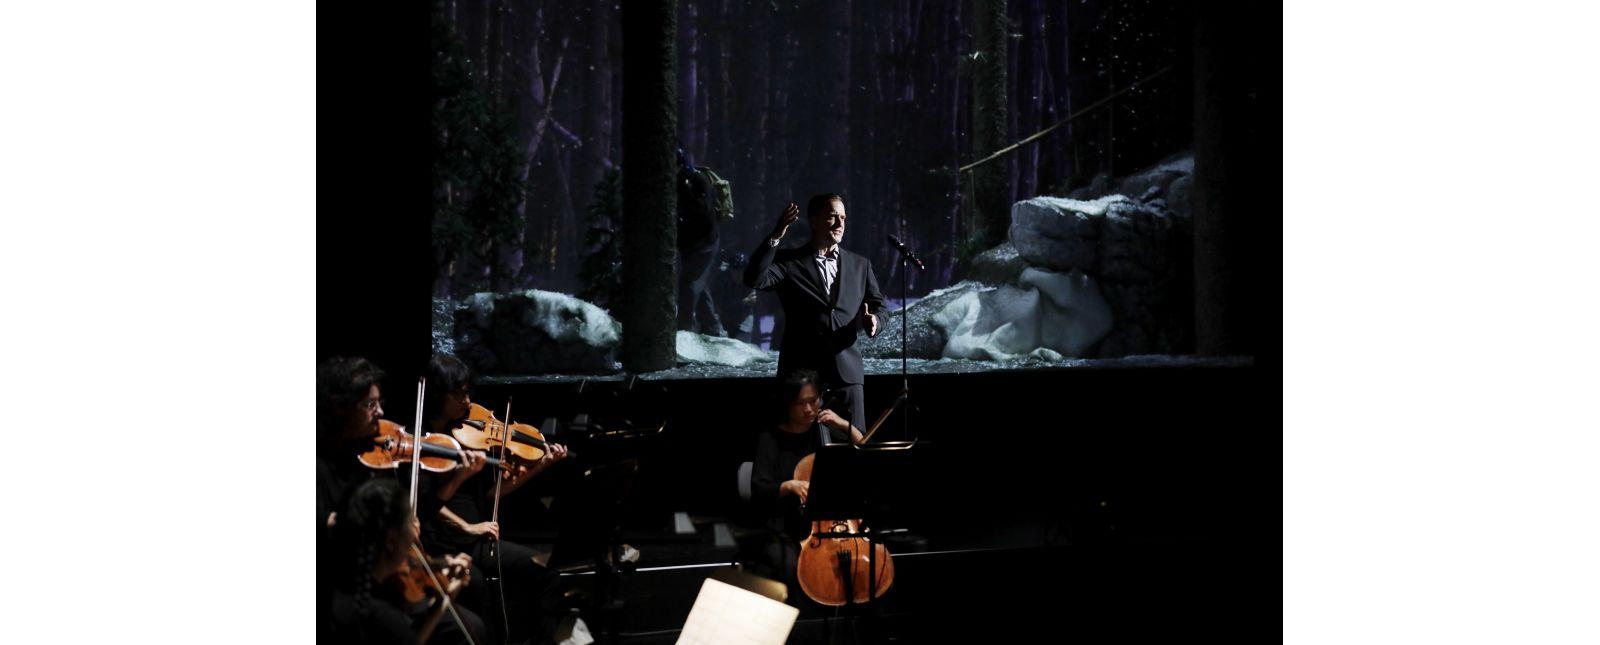 SCHAUINSLAND - The Misfortune of the English // Fabian Gerhardt / Philharmonisches Orchester Freiburg / Statisterie des Theater Freiburg // Foto: Paul Leclaire